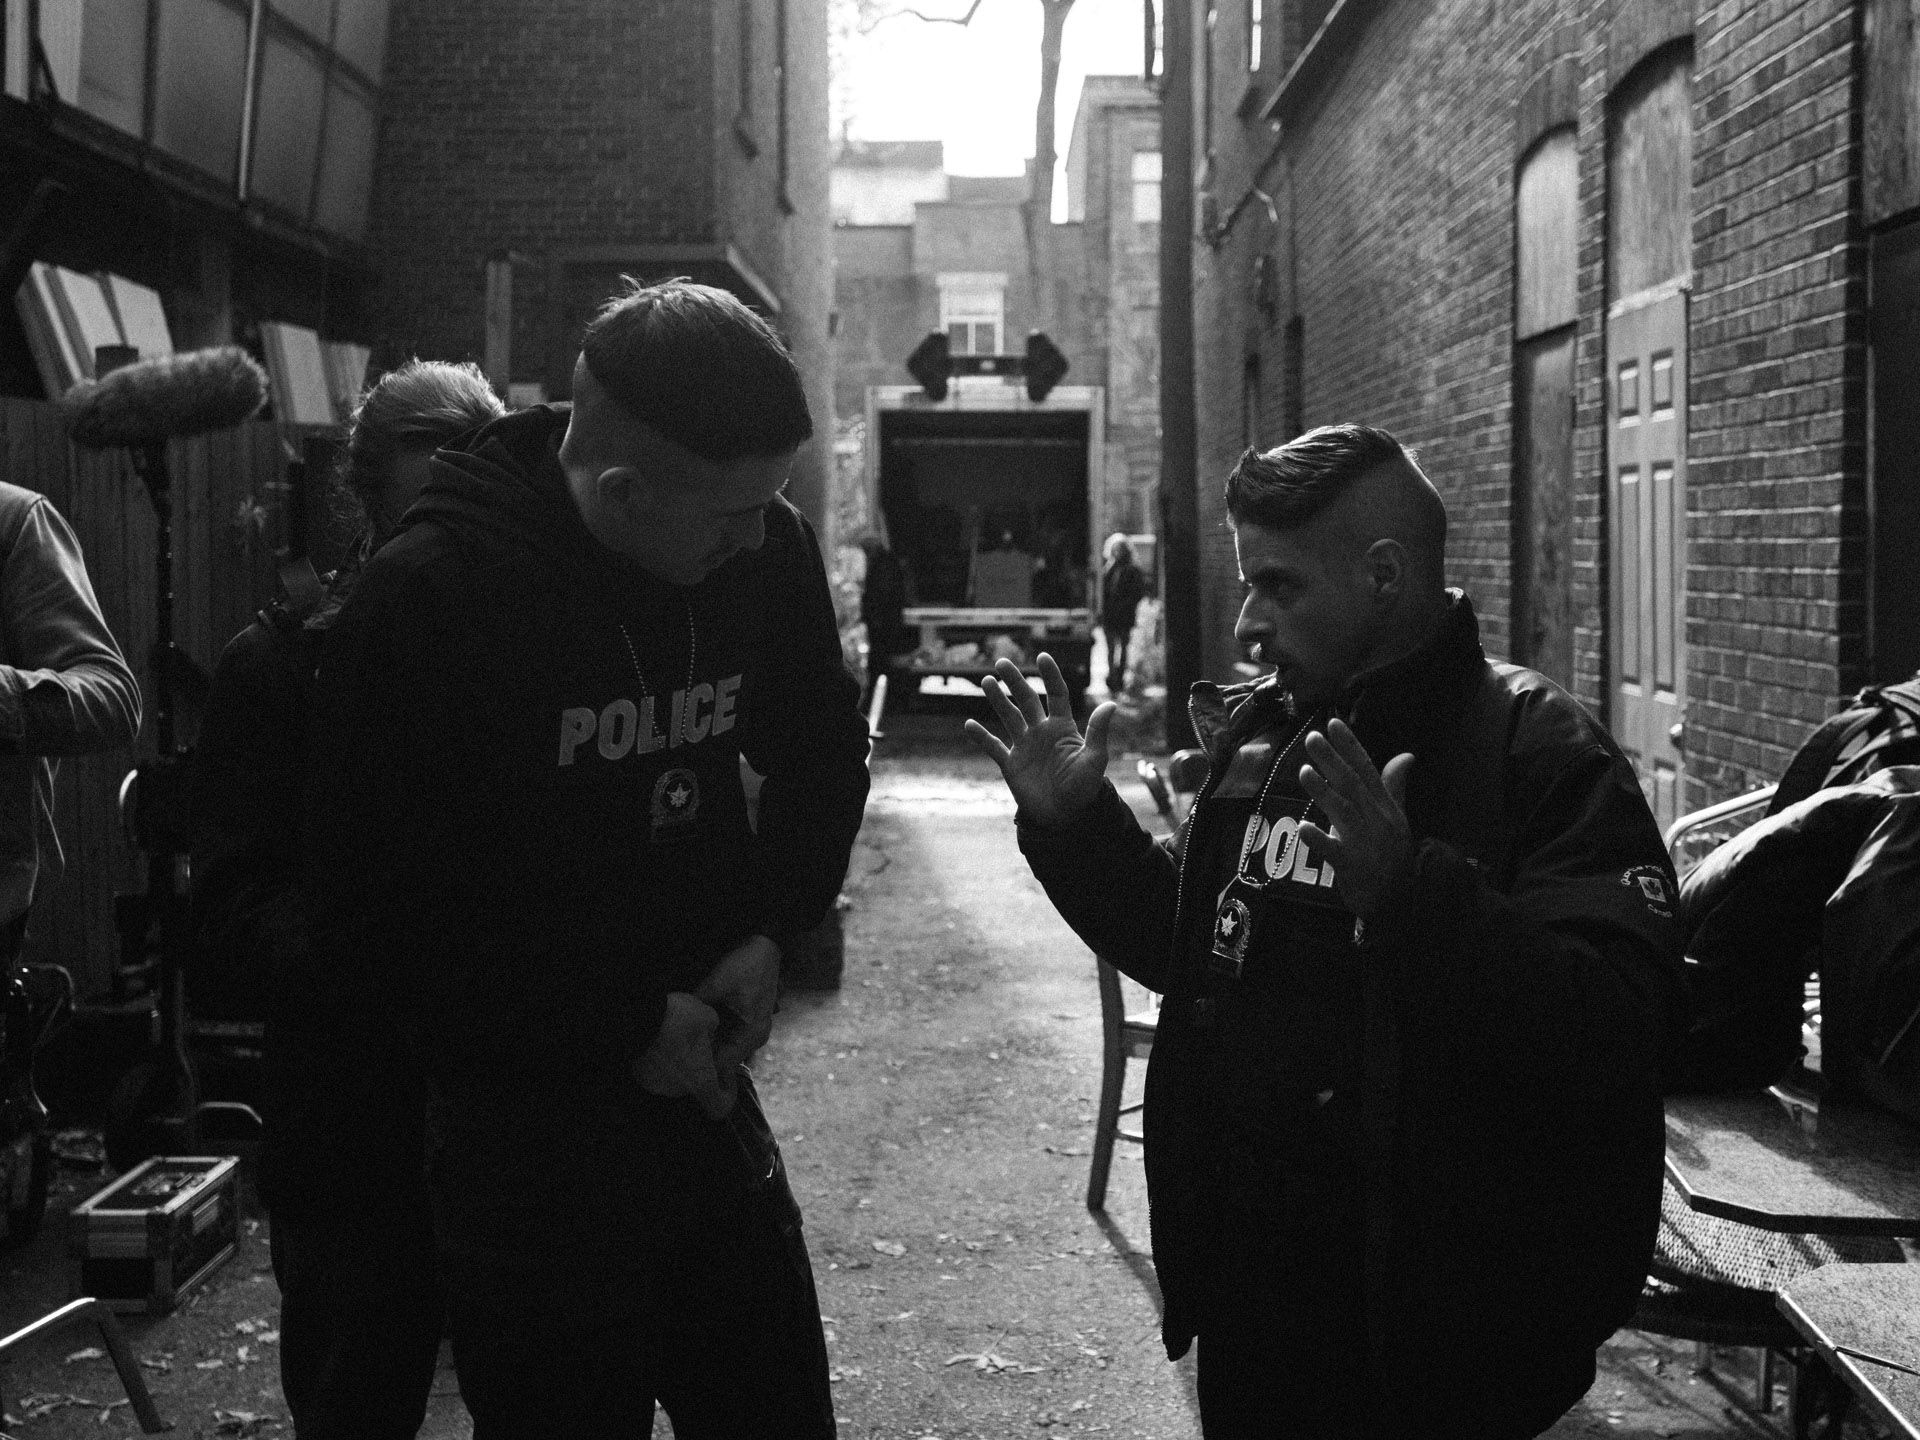 actors Hugolin Chevrette-Landesque and Emile Schneider dressed as cops talking in alley in behind the scenes for TV series La Loi C'est La Loi filmed by Les Gamins for TV5 Unis